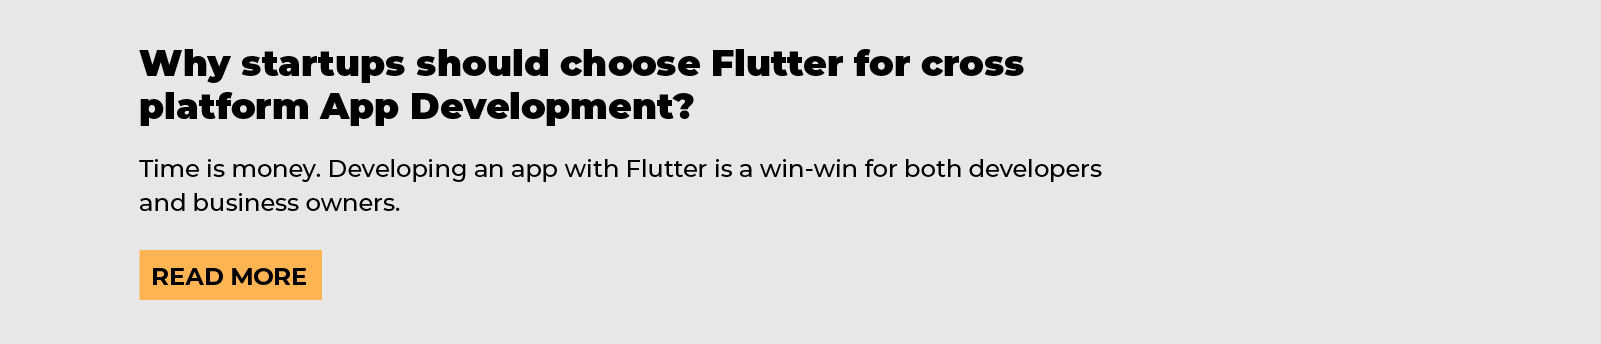 cross-platform development, why startups should choose flutter for cross-platform app development, agiletech